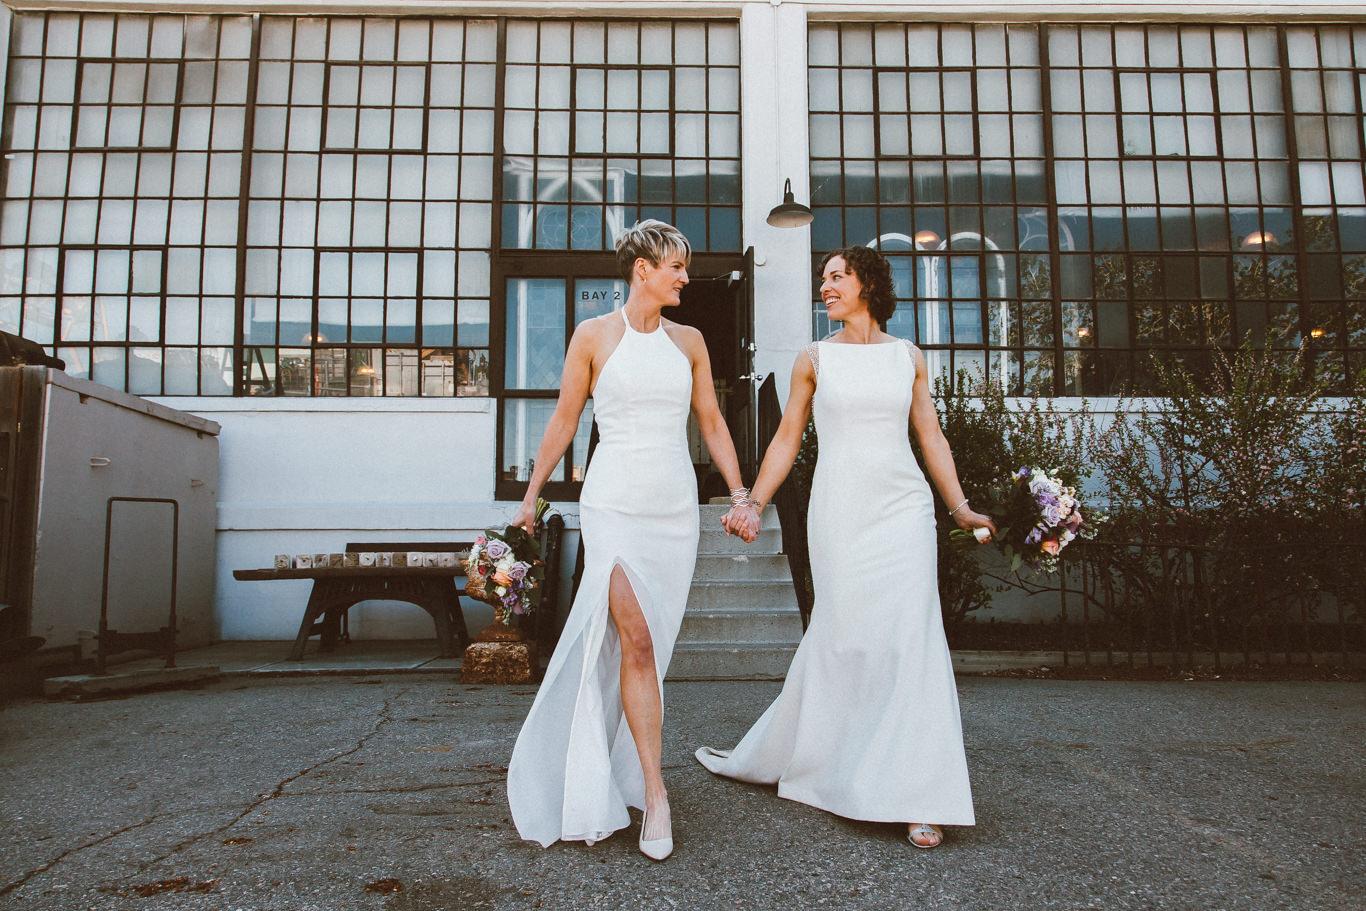 Lindsay-and-Heather-Charbar-Restaurant-Wedding-in-Calgary-60